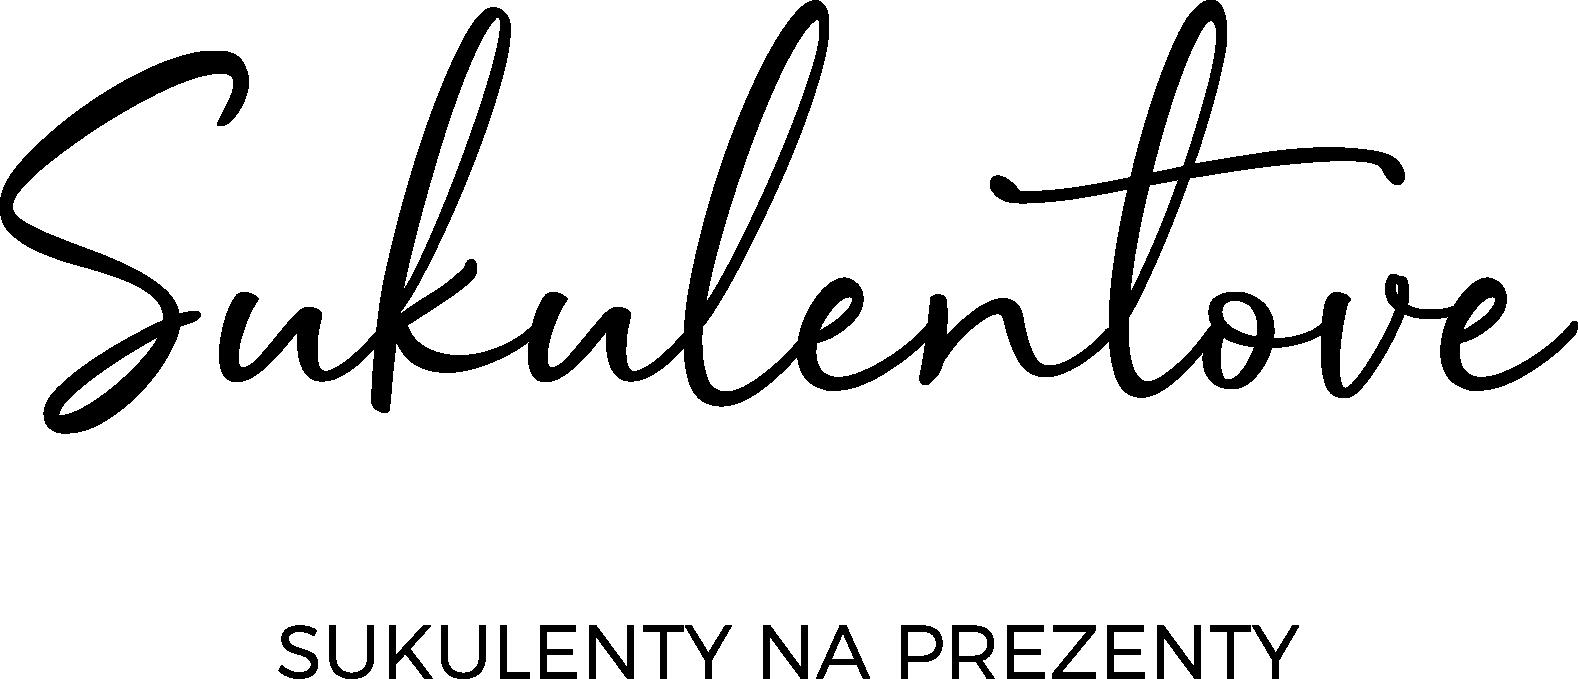 Sukulentove